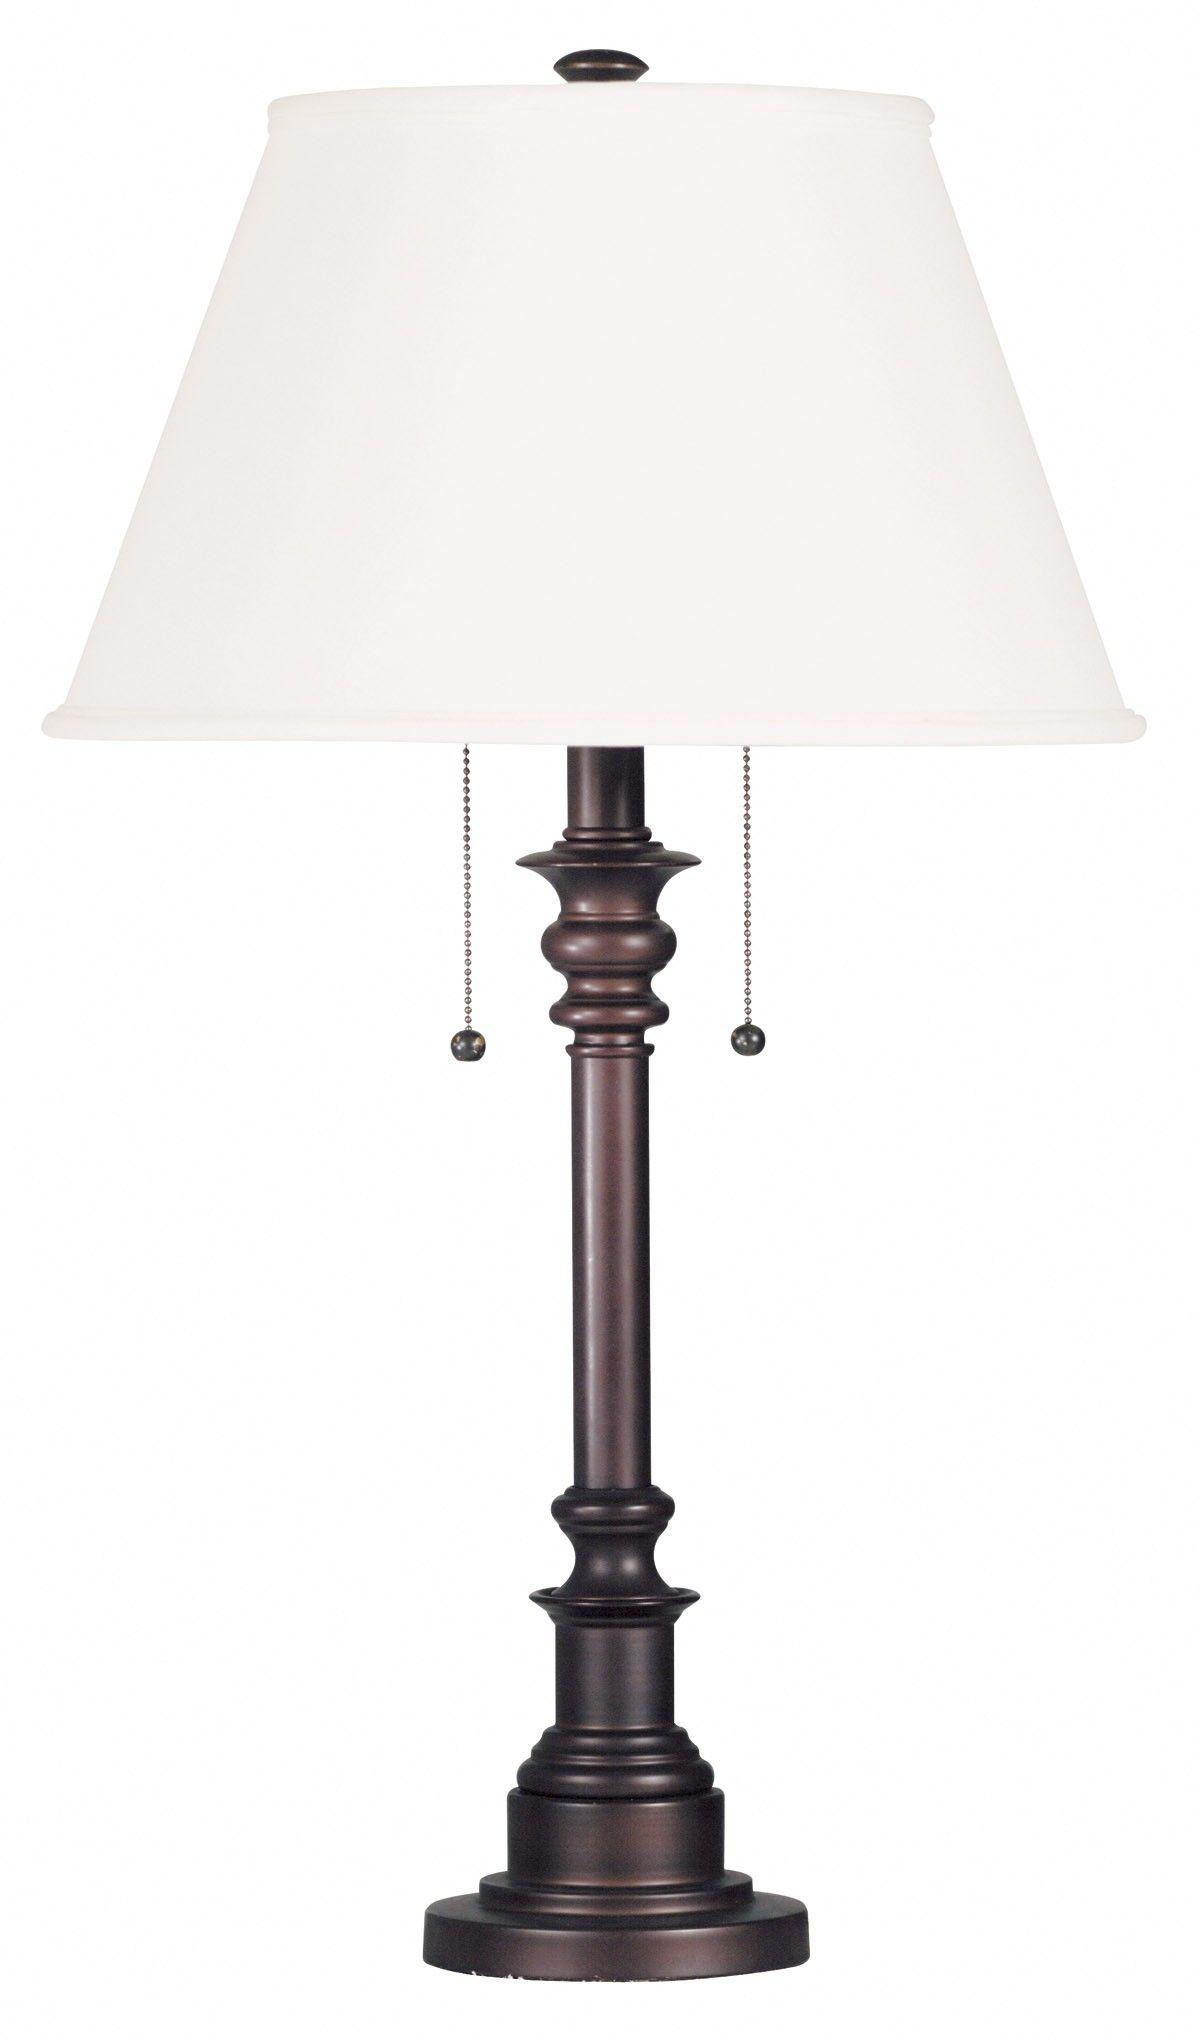 Kenroy Home Spyglass Table Lamp In Bronze Finish Classic Table Lamp Kenroy Home Table Lamp